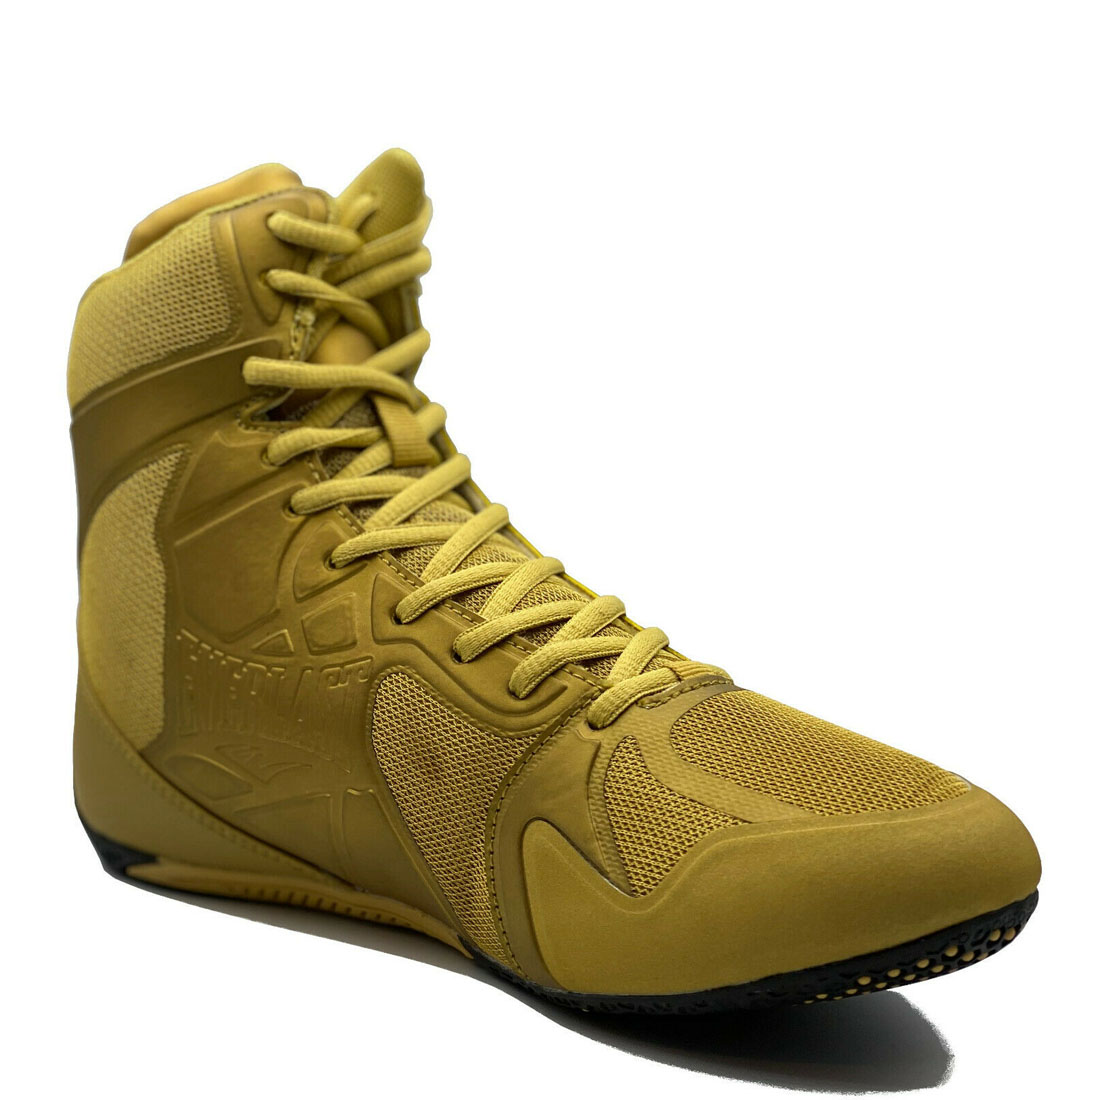 Everlast Hommes Ultimate Pro Chaussures Noir Or Boxe SPORTS Bottes ELM-94E